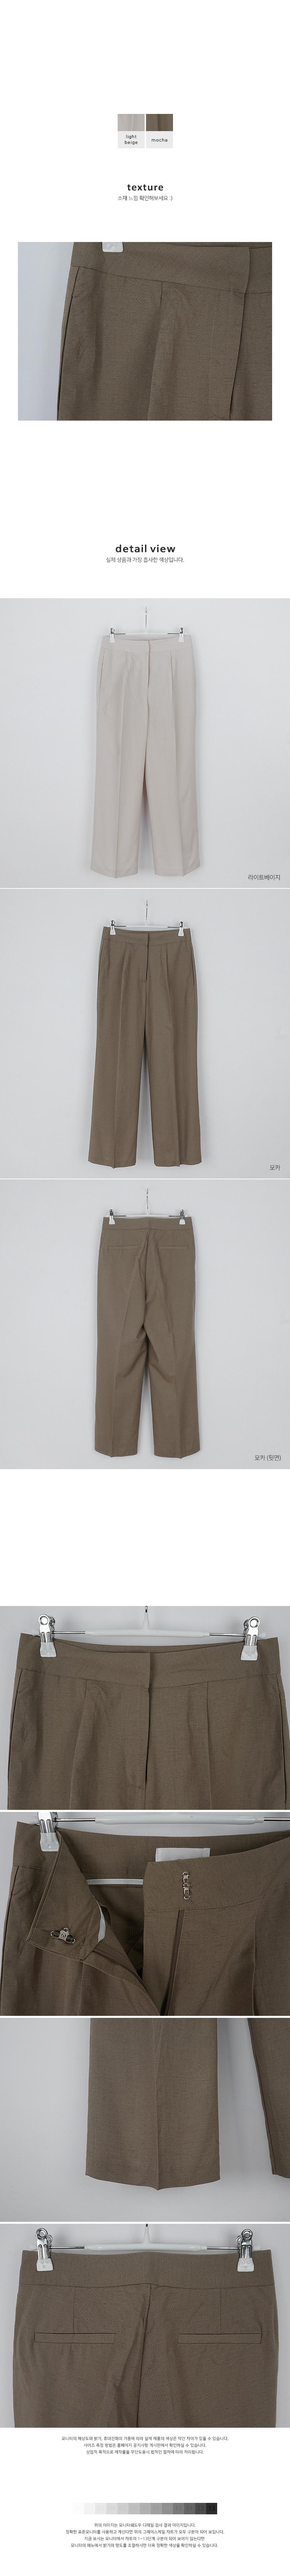 Dry linen pants